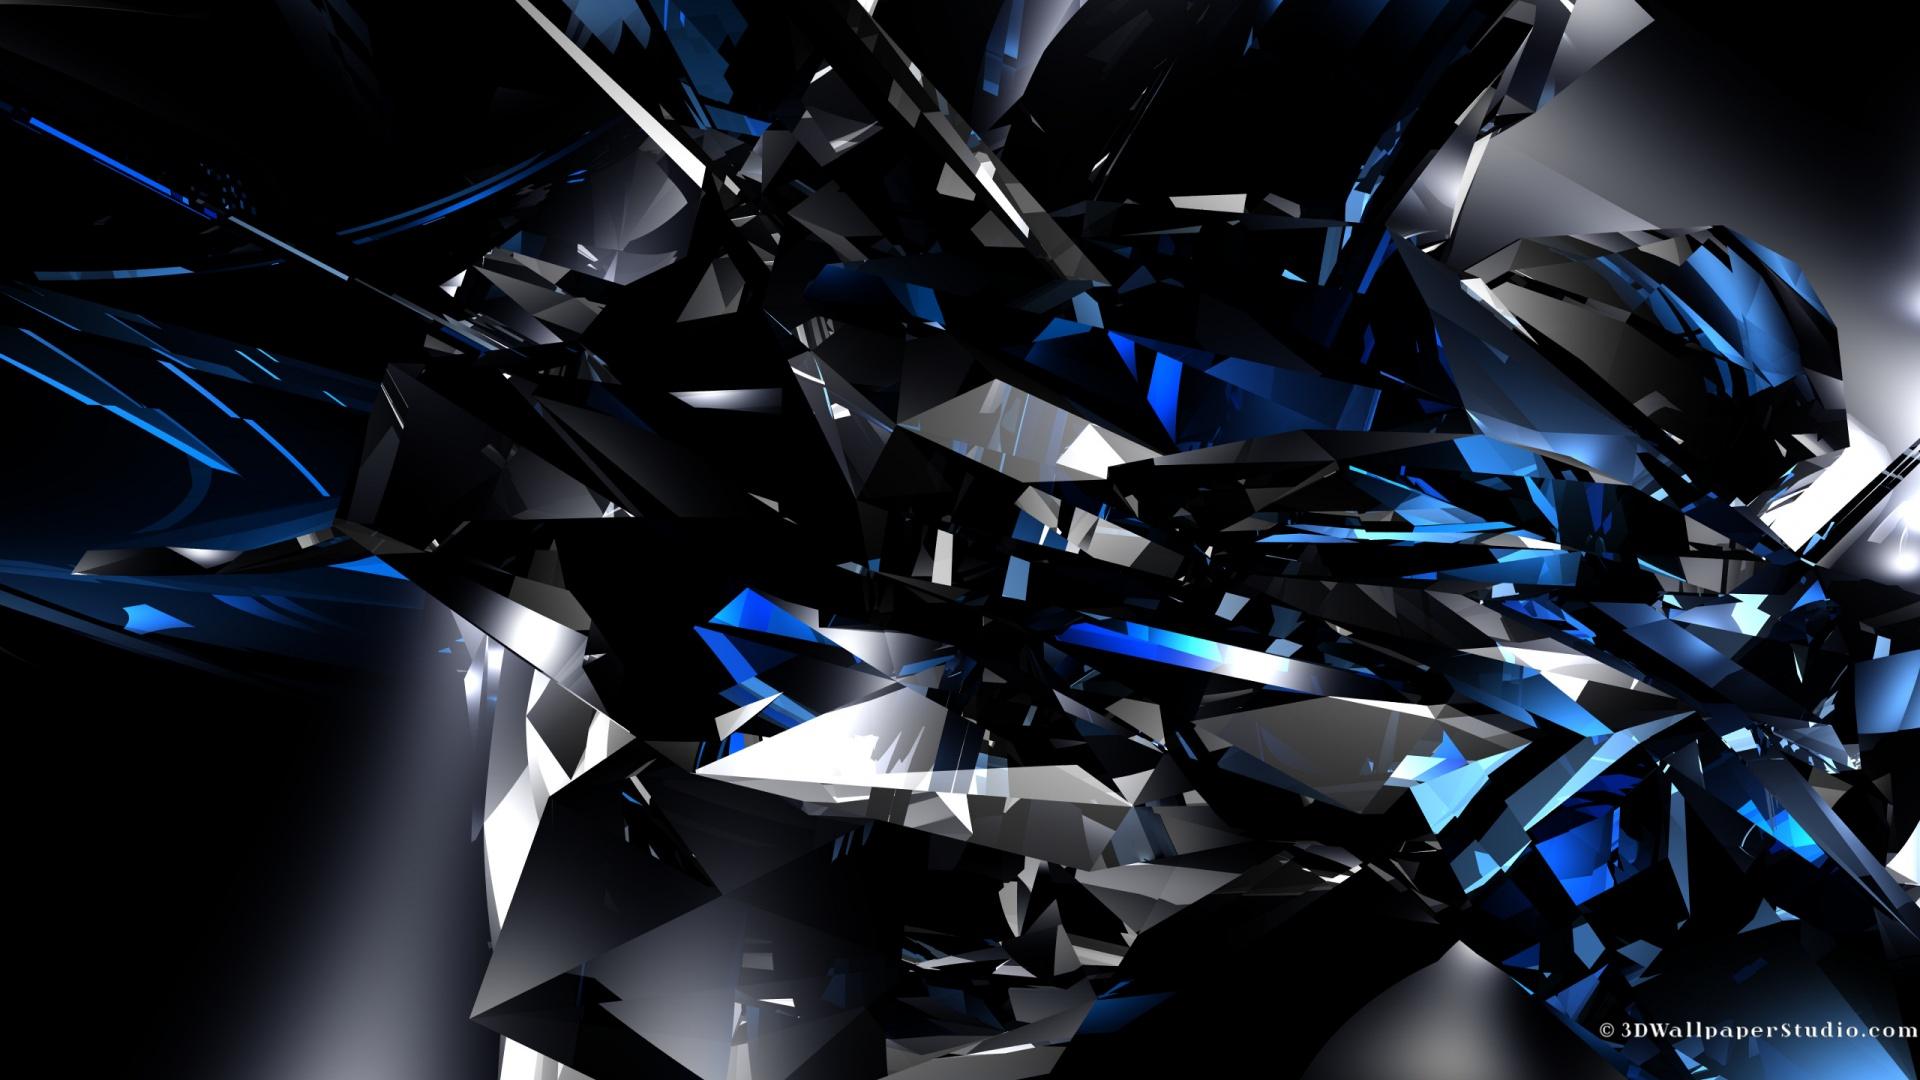 3d Blue Abstract Wallpaper Abstract Wallpaper HD 1920x1080